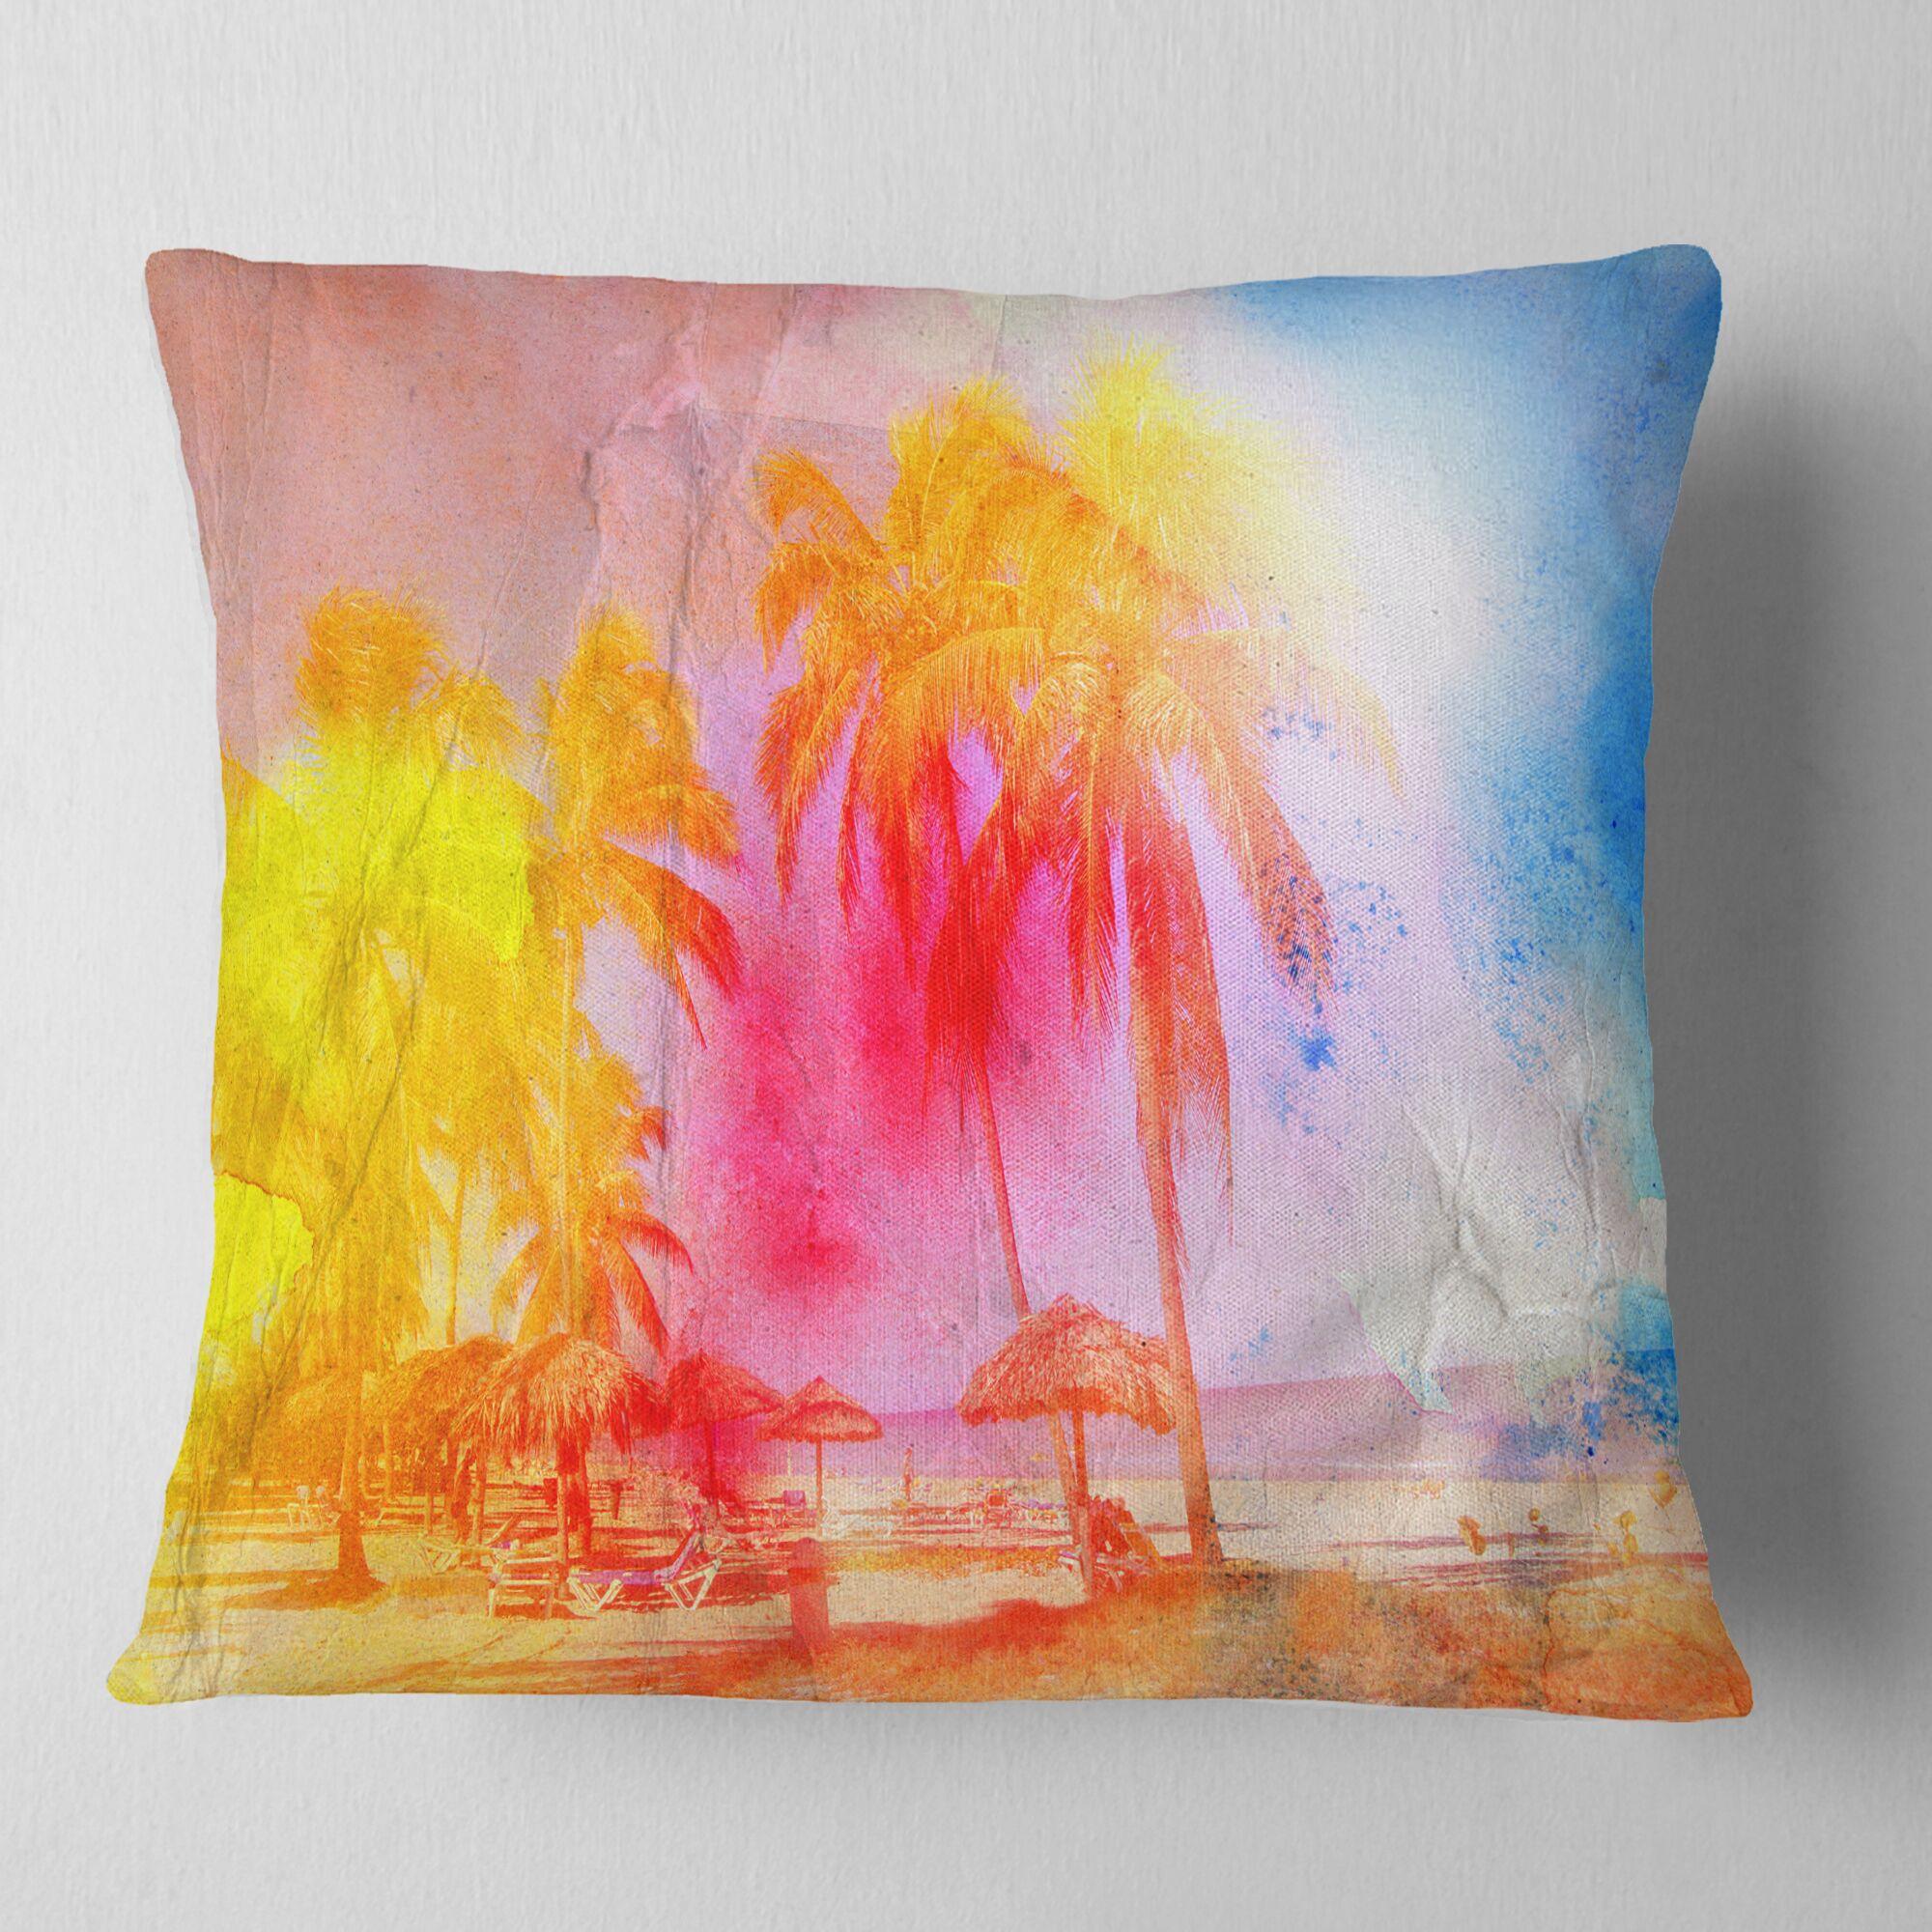 Retro Palms Watercolor Pillow Size: 18